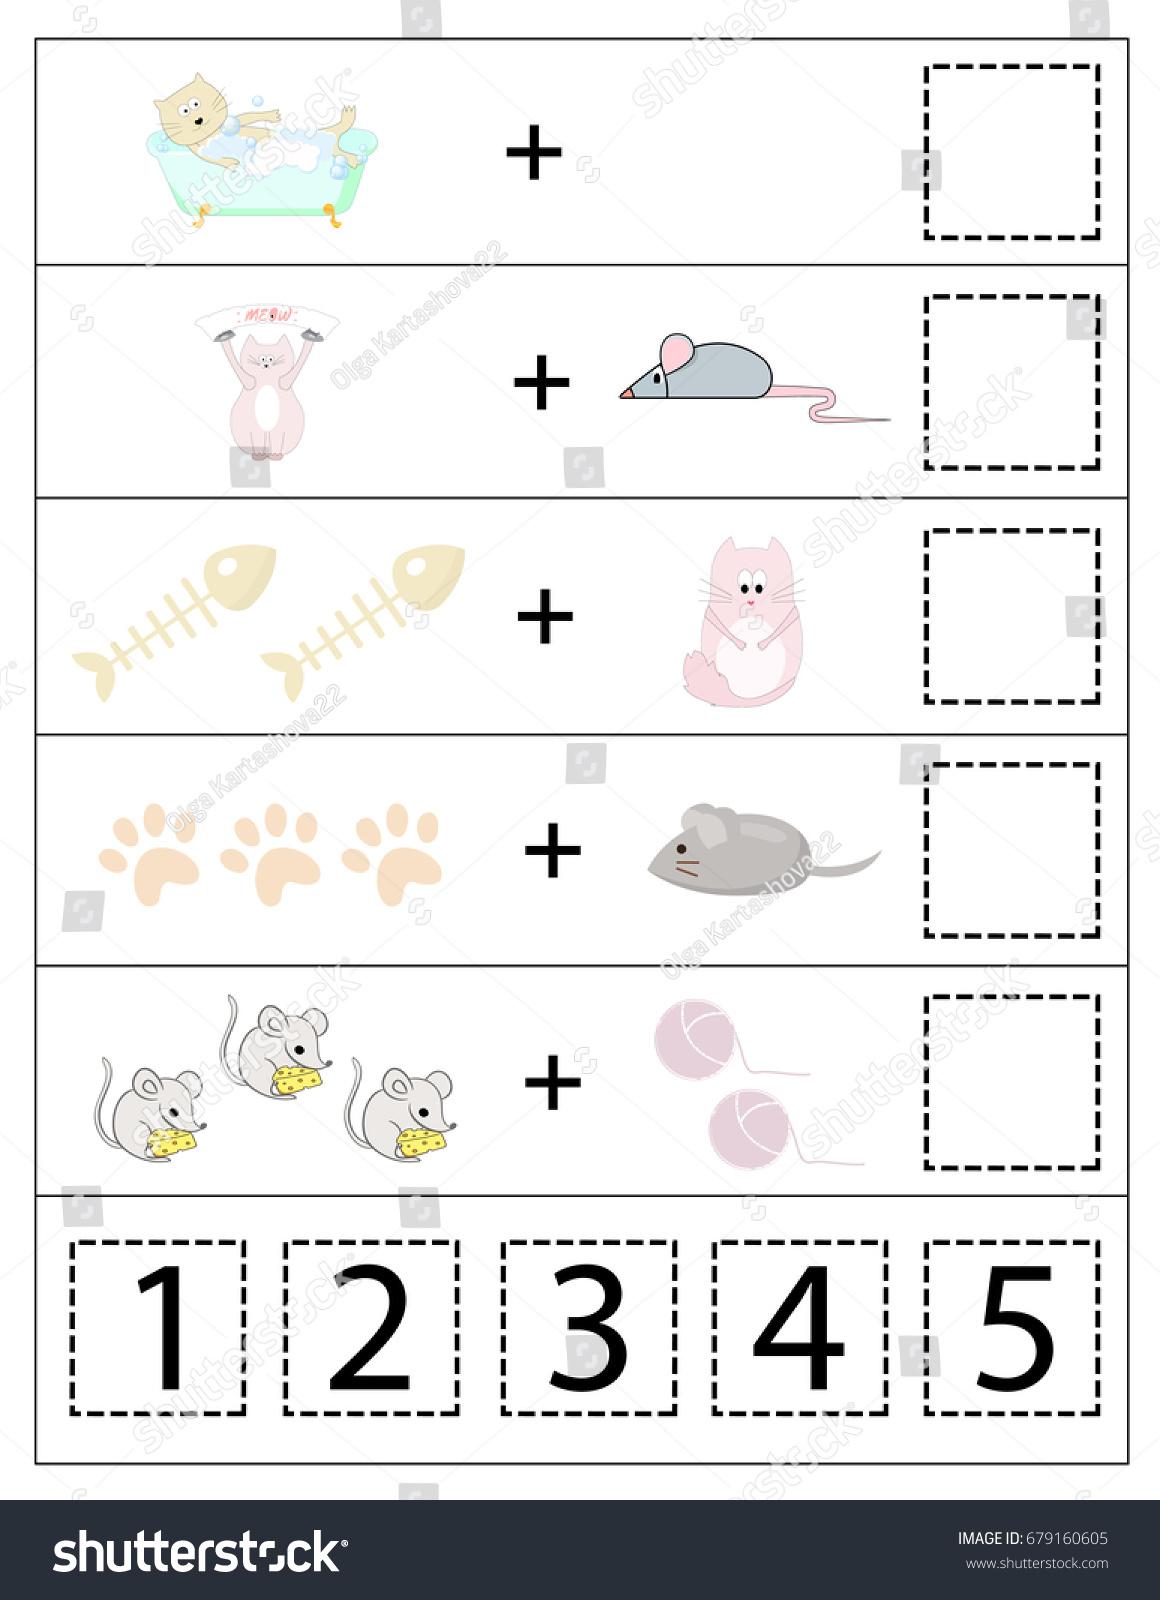 Math Kids Game Cats Educational Children Stock Photo (Photo, Vector ...